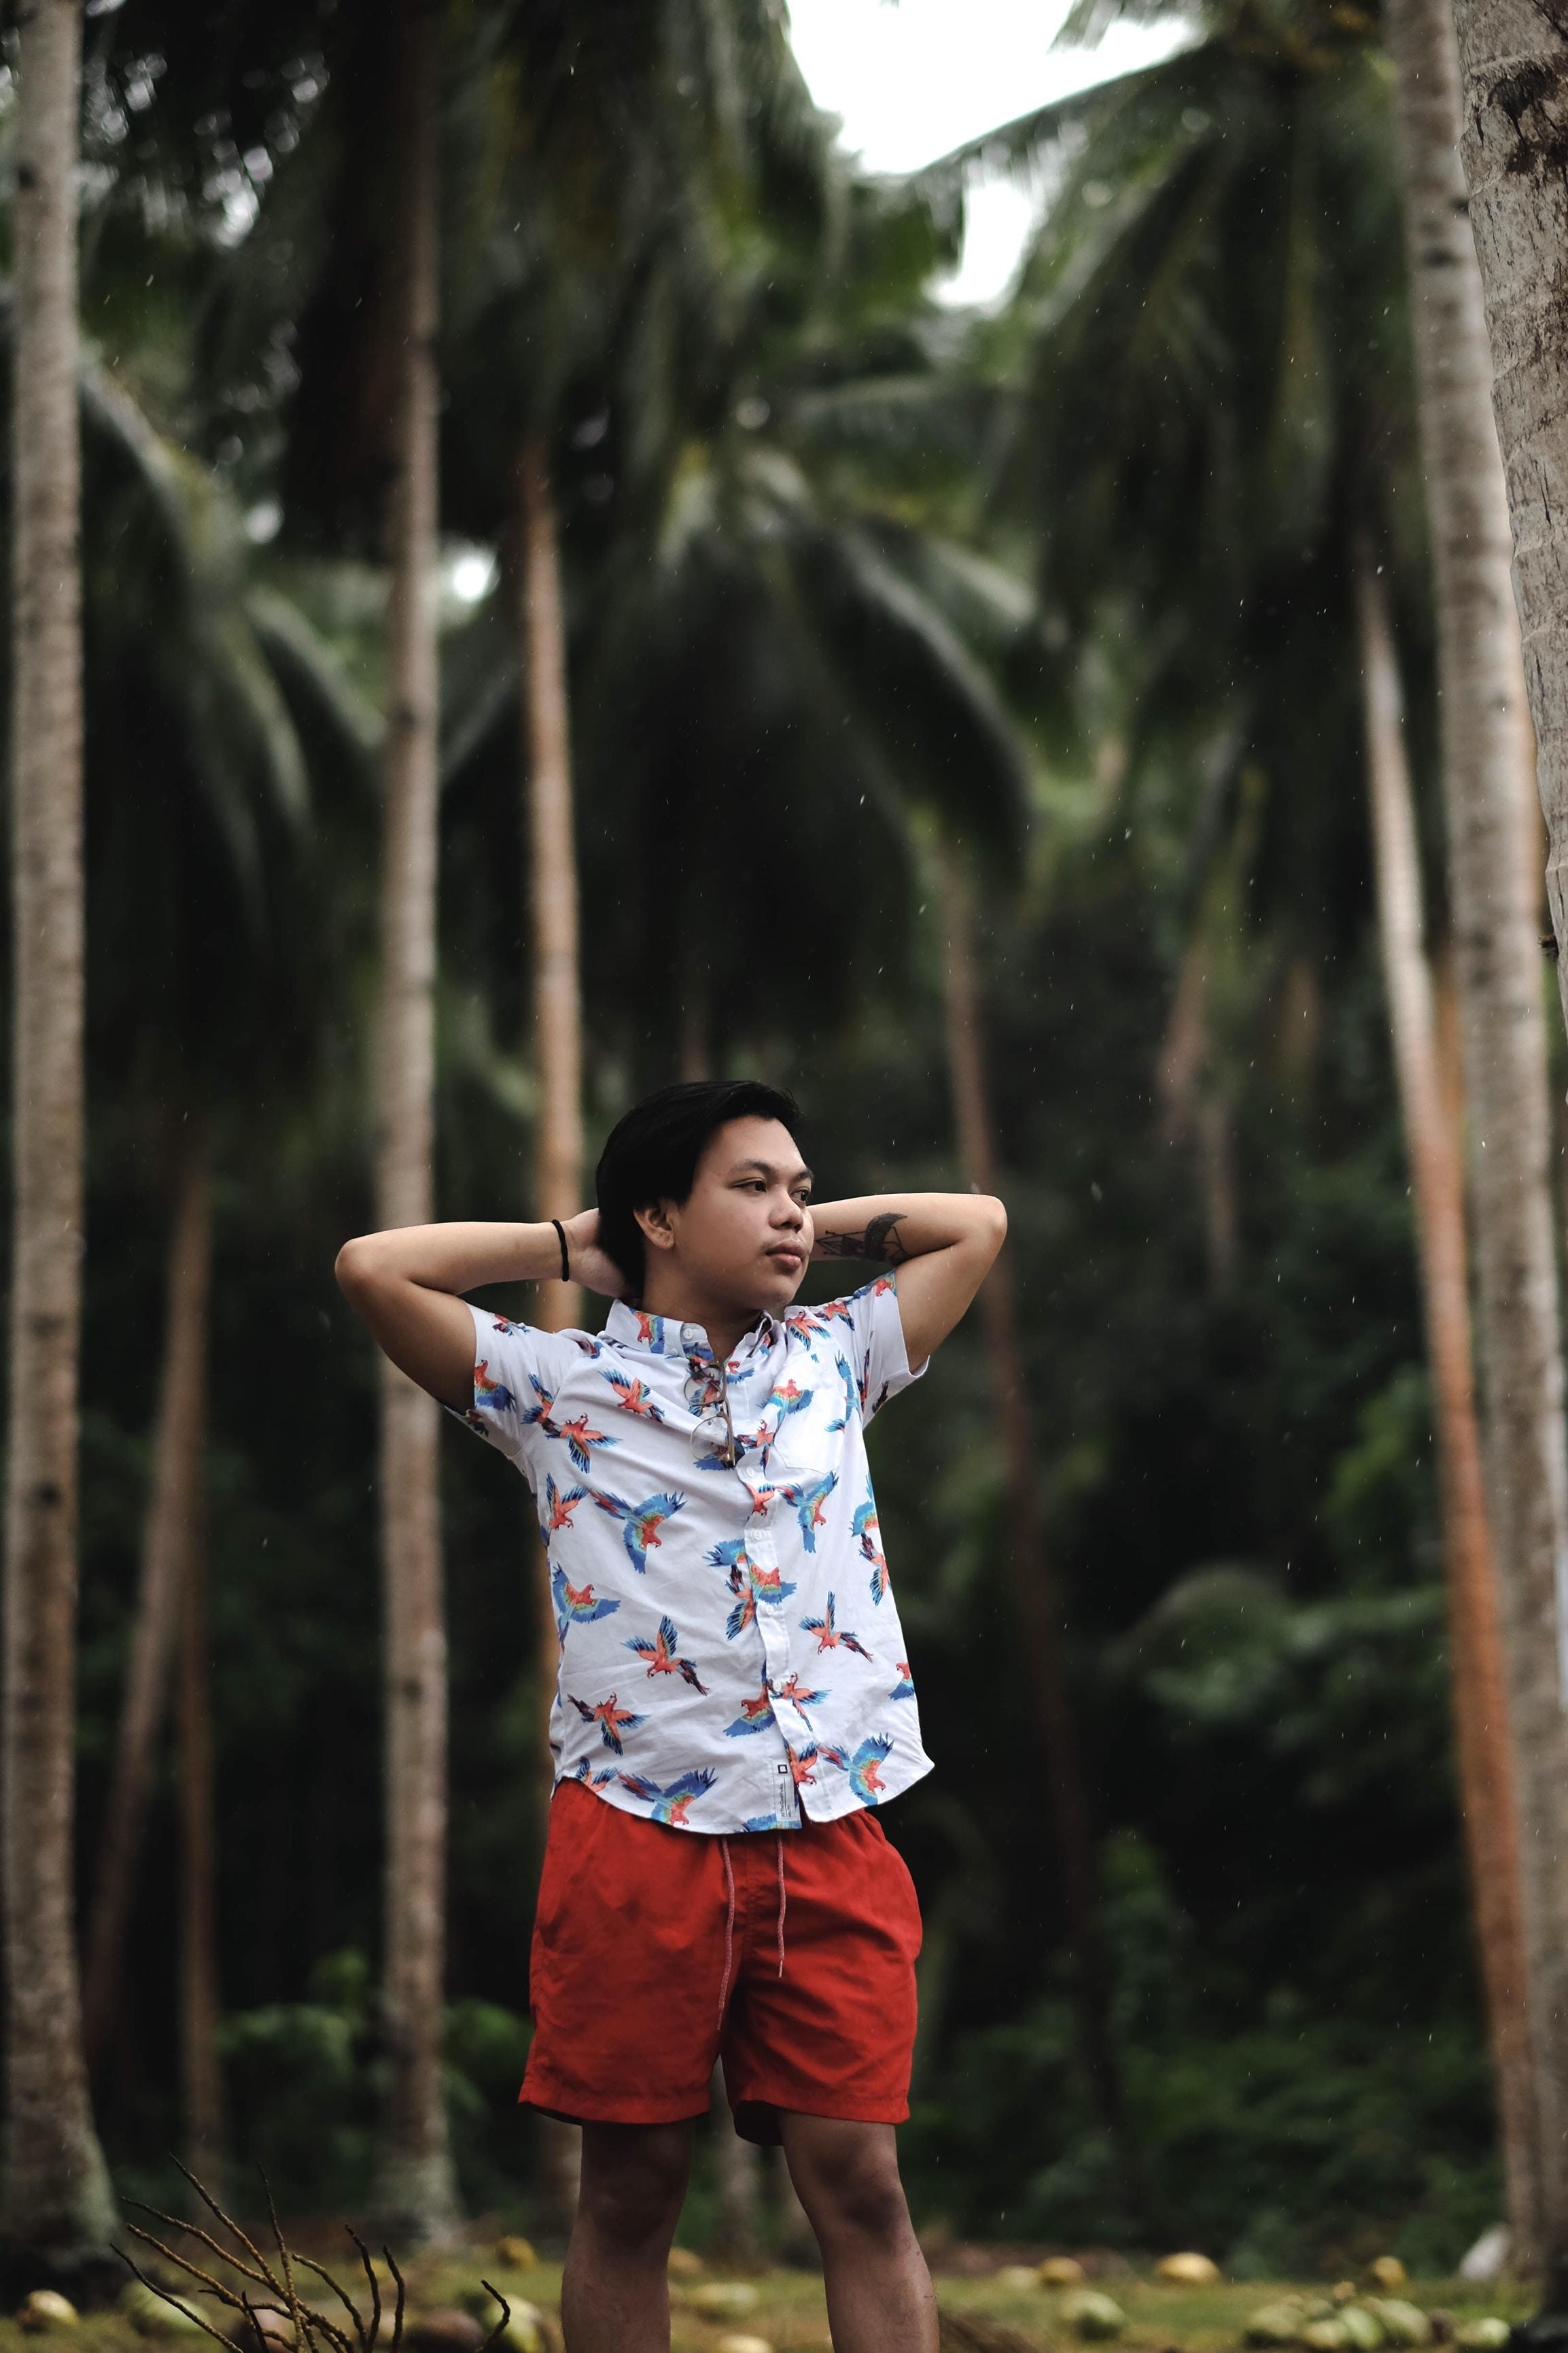 boy standing near trees